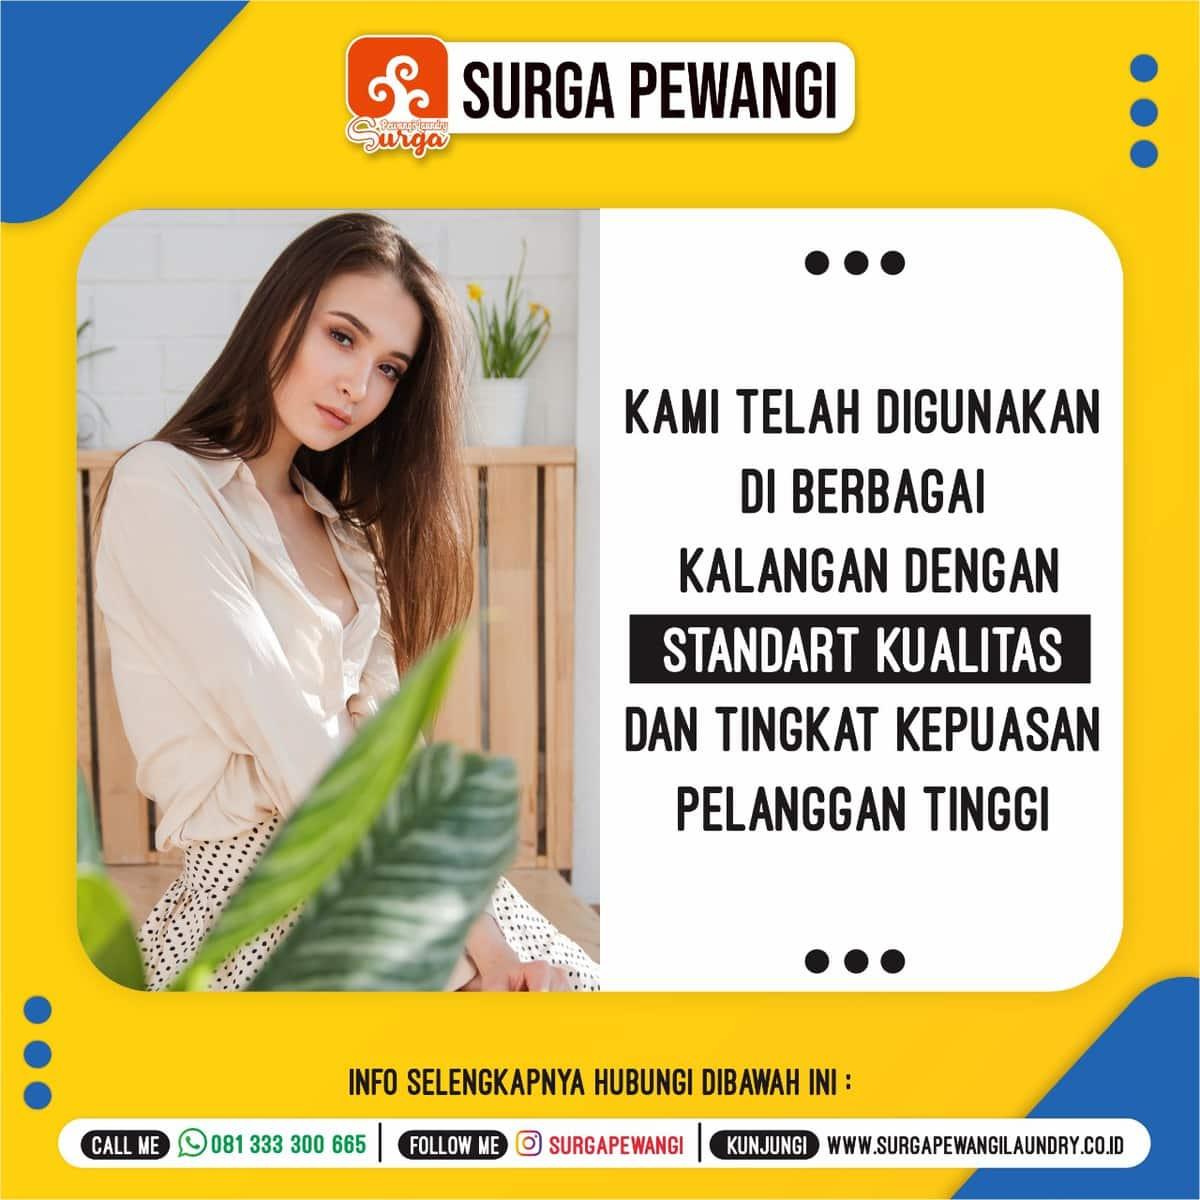 e6768884 eace 4bc9 a917 9feaca1b5d0a - Pabrik Pewangi Laundry Surga Paling The BEST se- Indonesia